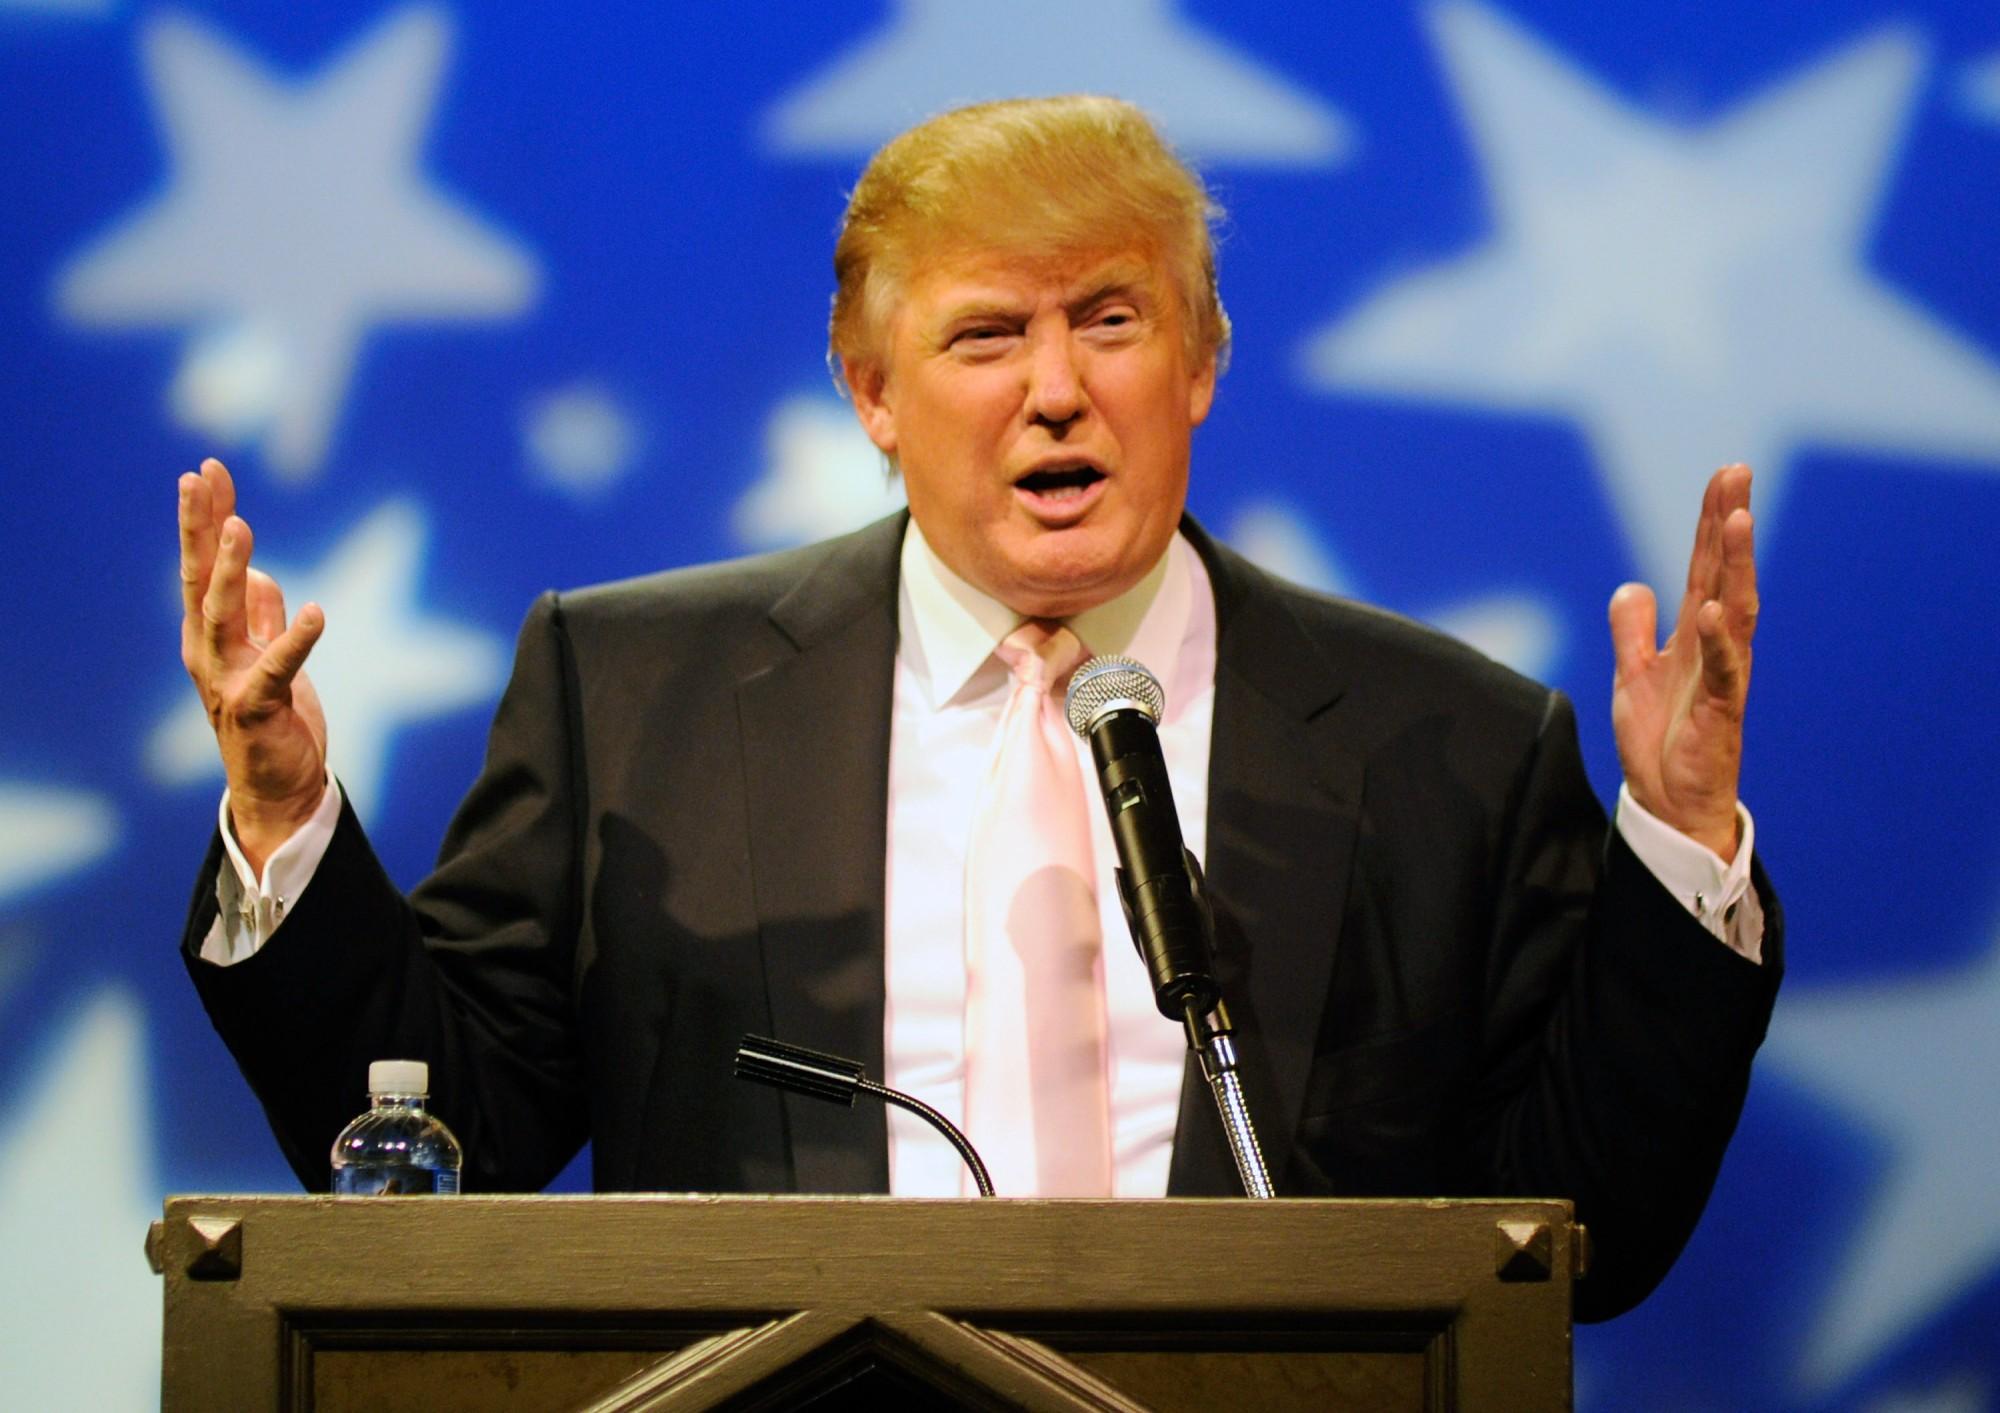 Зачем Трамп «лезет настену»?